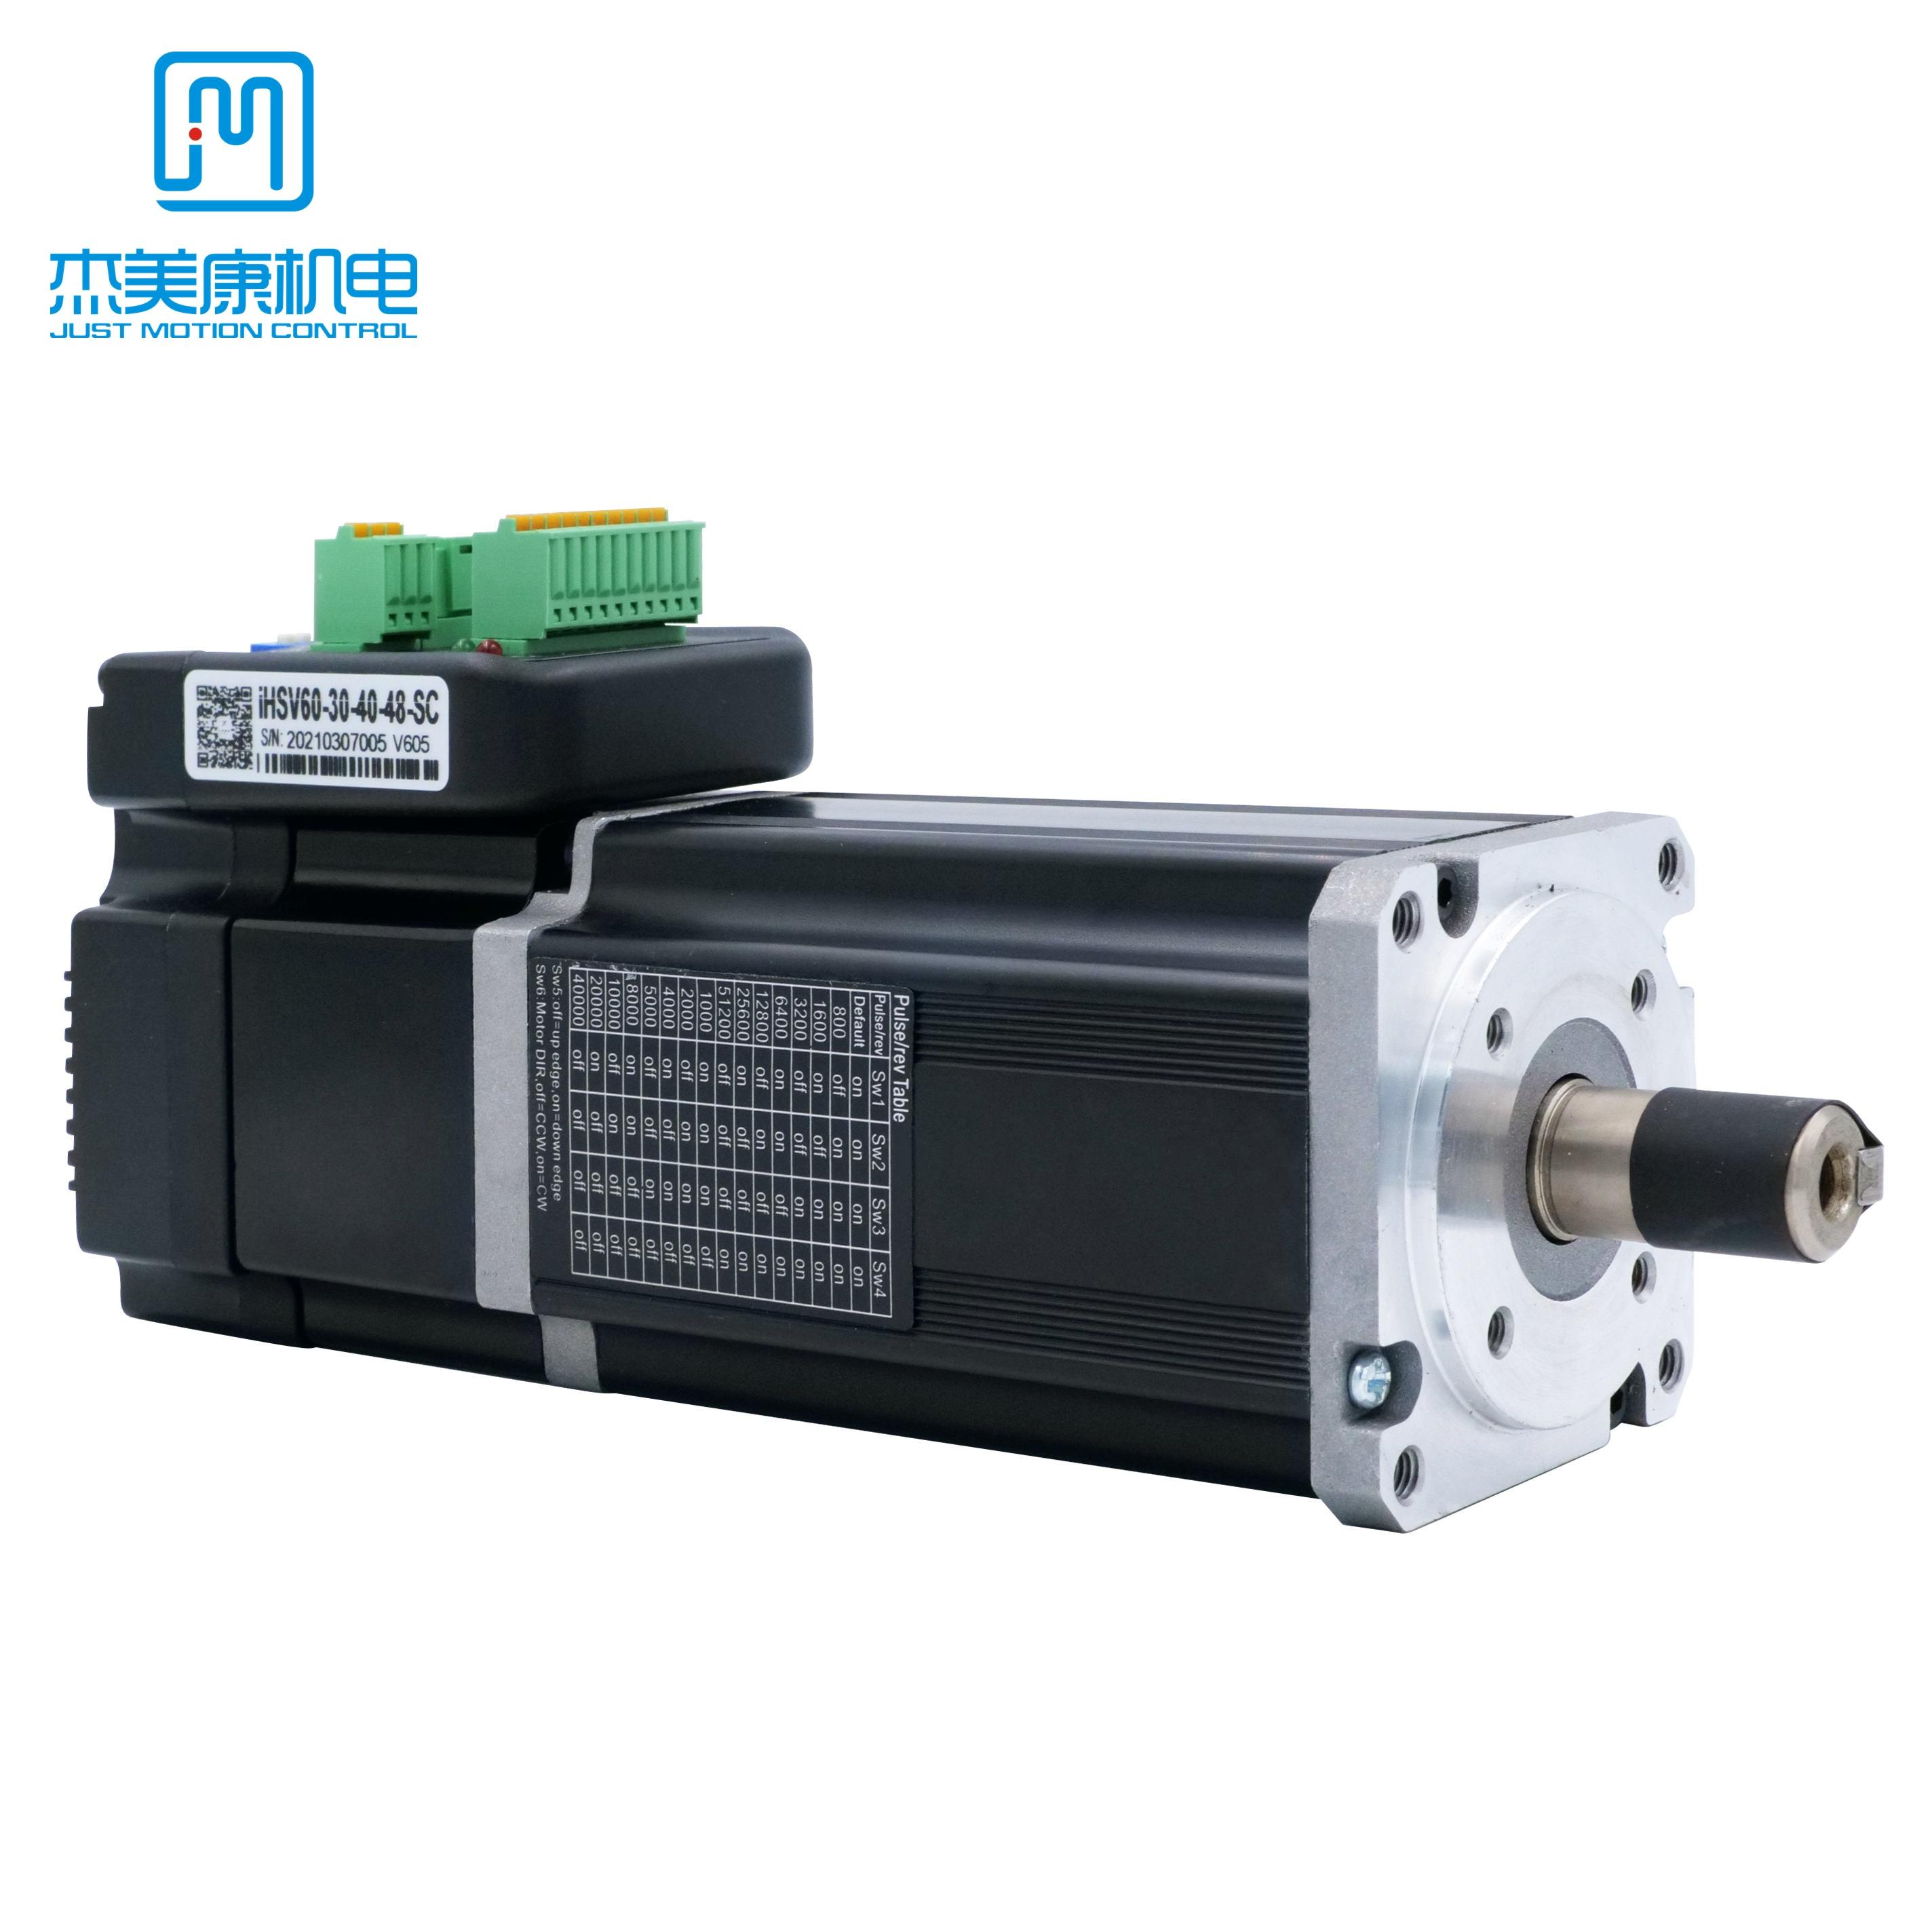 JMC 3-Phase 1.27N.m 400 واط 48 فولت 3000 دورة في الدقيقة محرك معزز متكامل مع فرامل احدث V605 سهل المؤازرة ل ماكينة بتحكم رقمي بالكمبيوتر IHSV60-30-40-48-SC